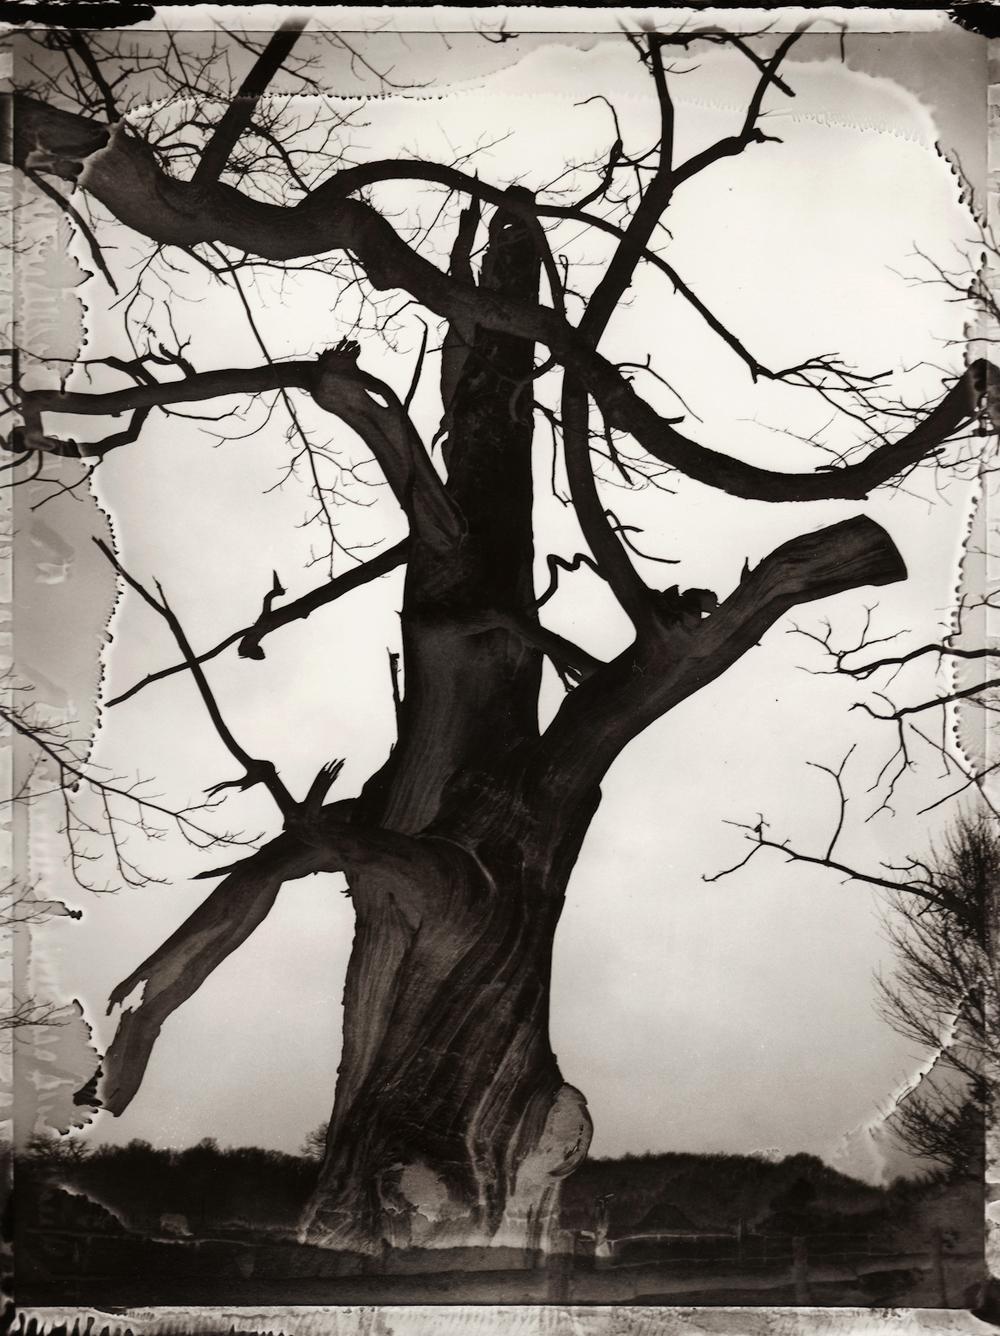 Pola-arbre 12.jpg